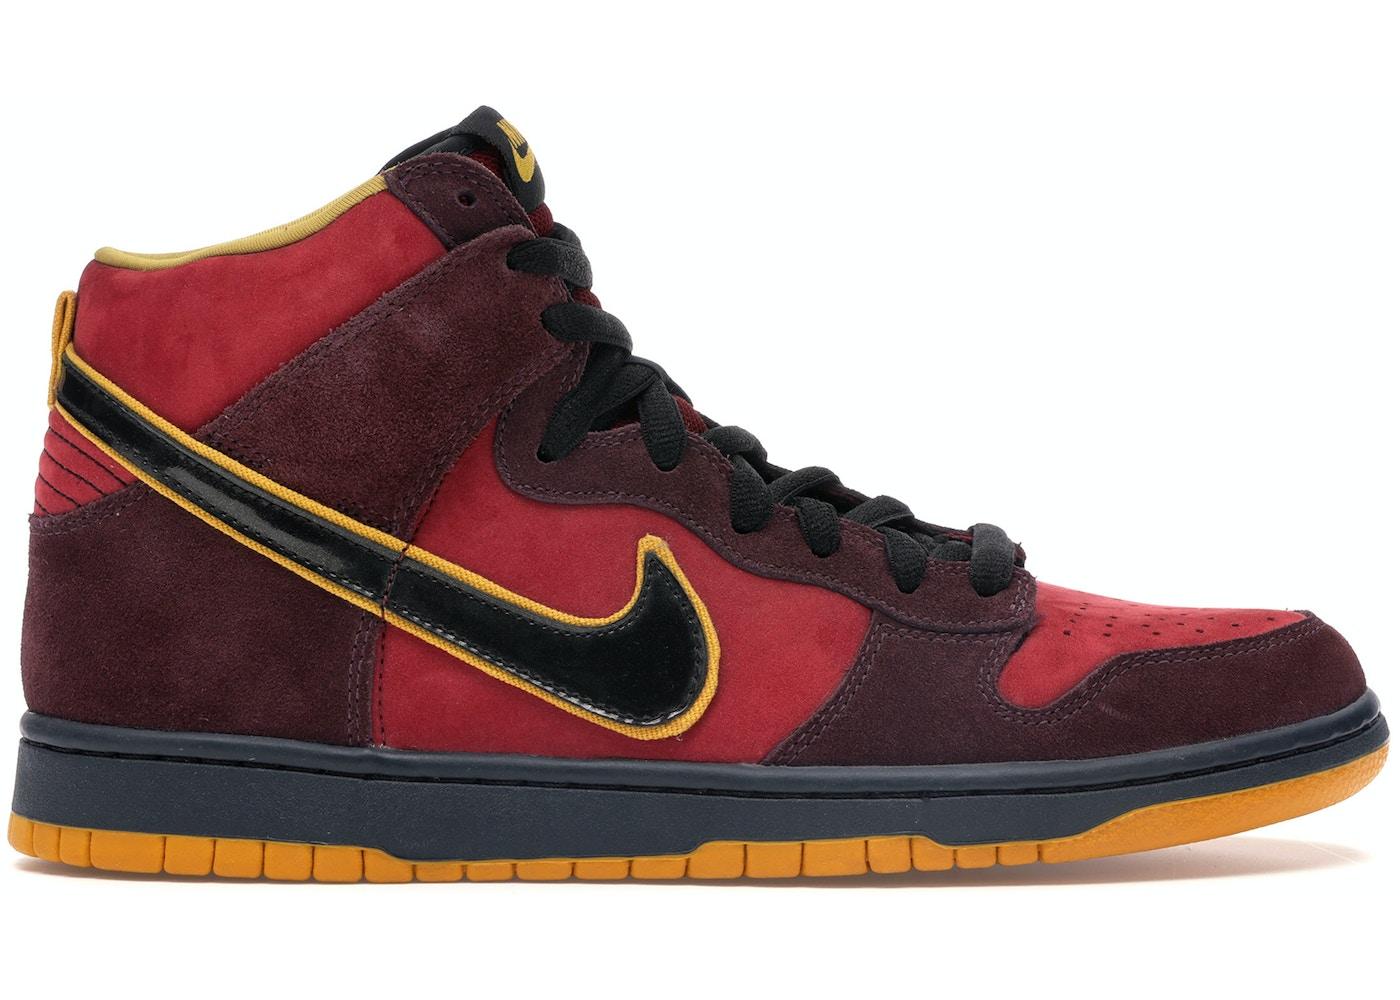 official photos d1e4b 231cb Nike Dunk SB High Iron Man - 313171-600